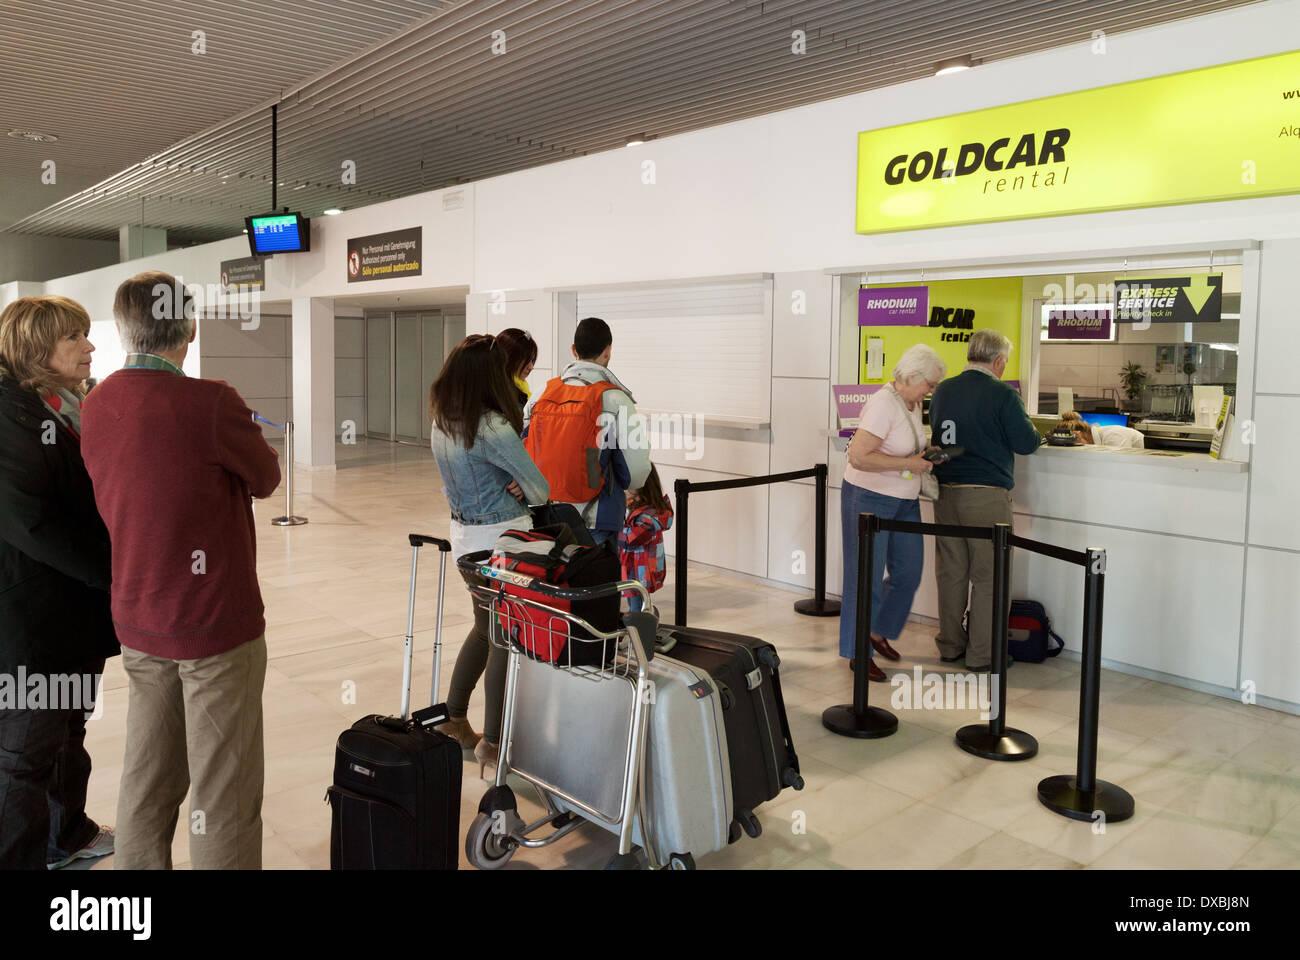 Car Hire Almeria Airport